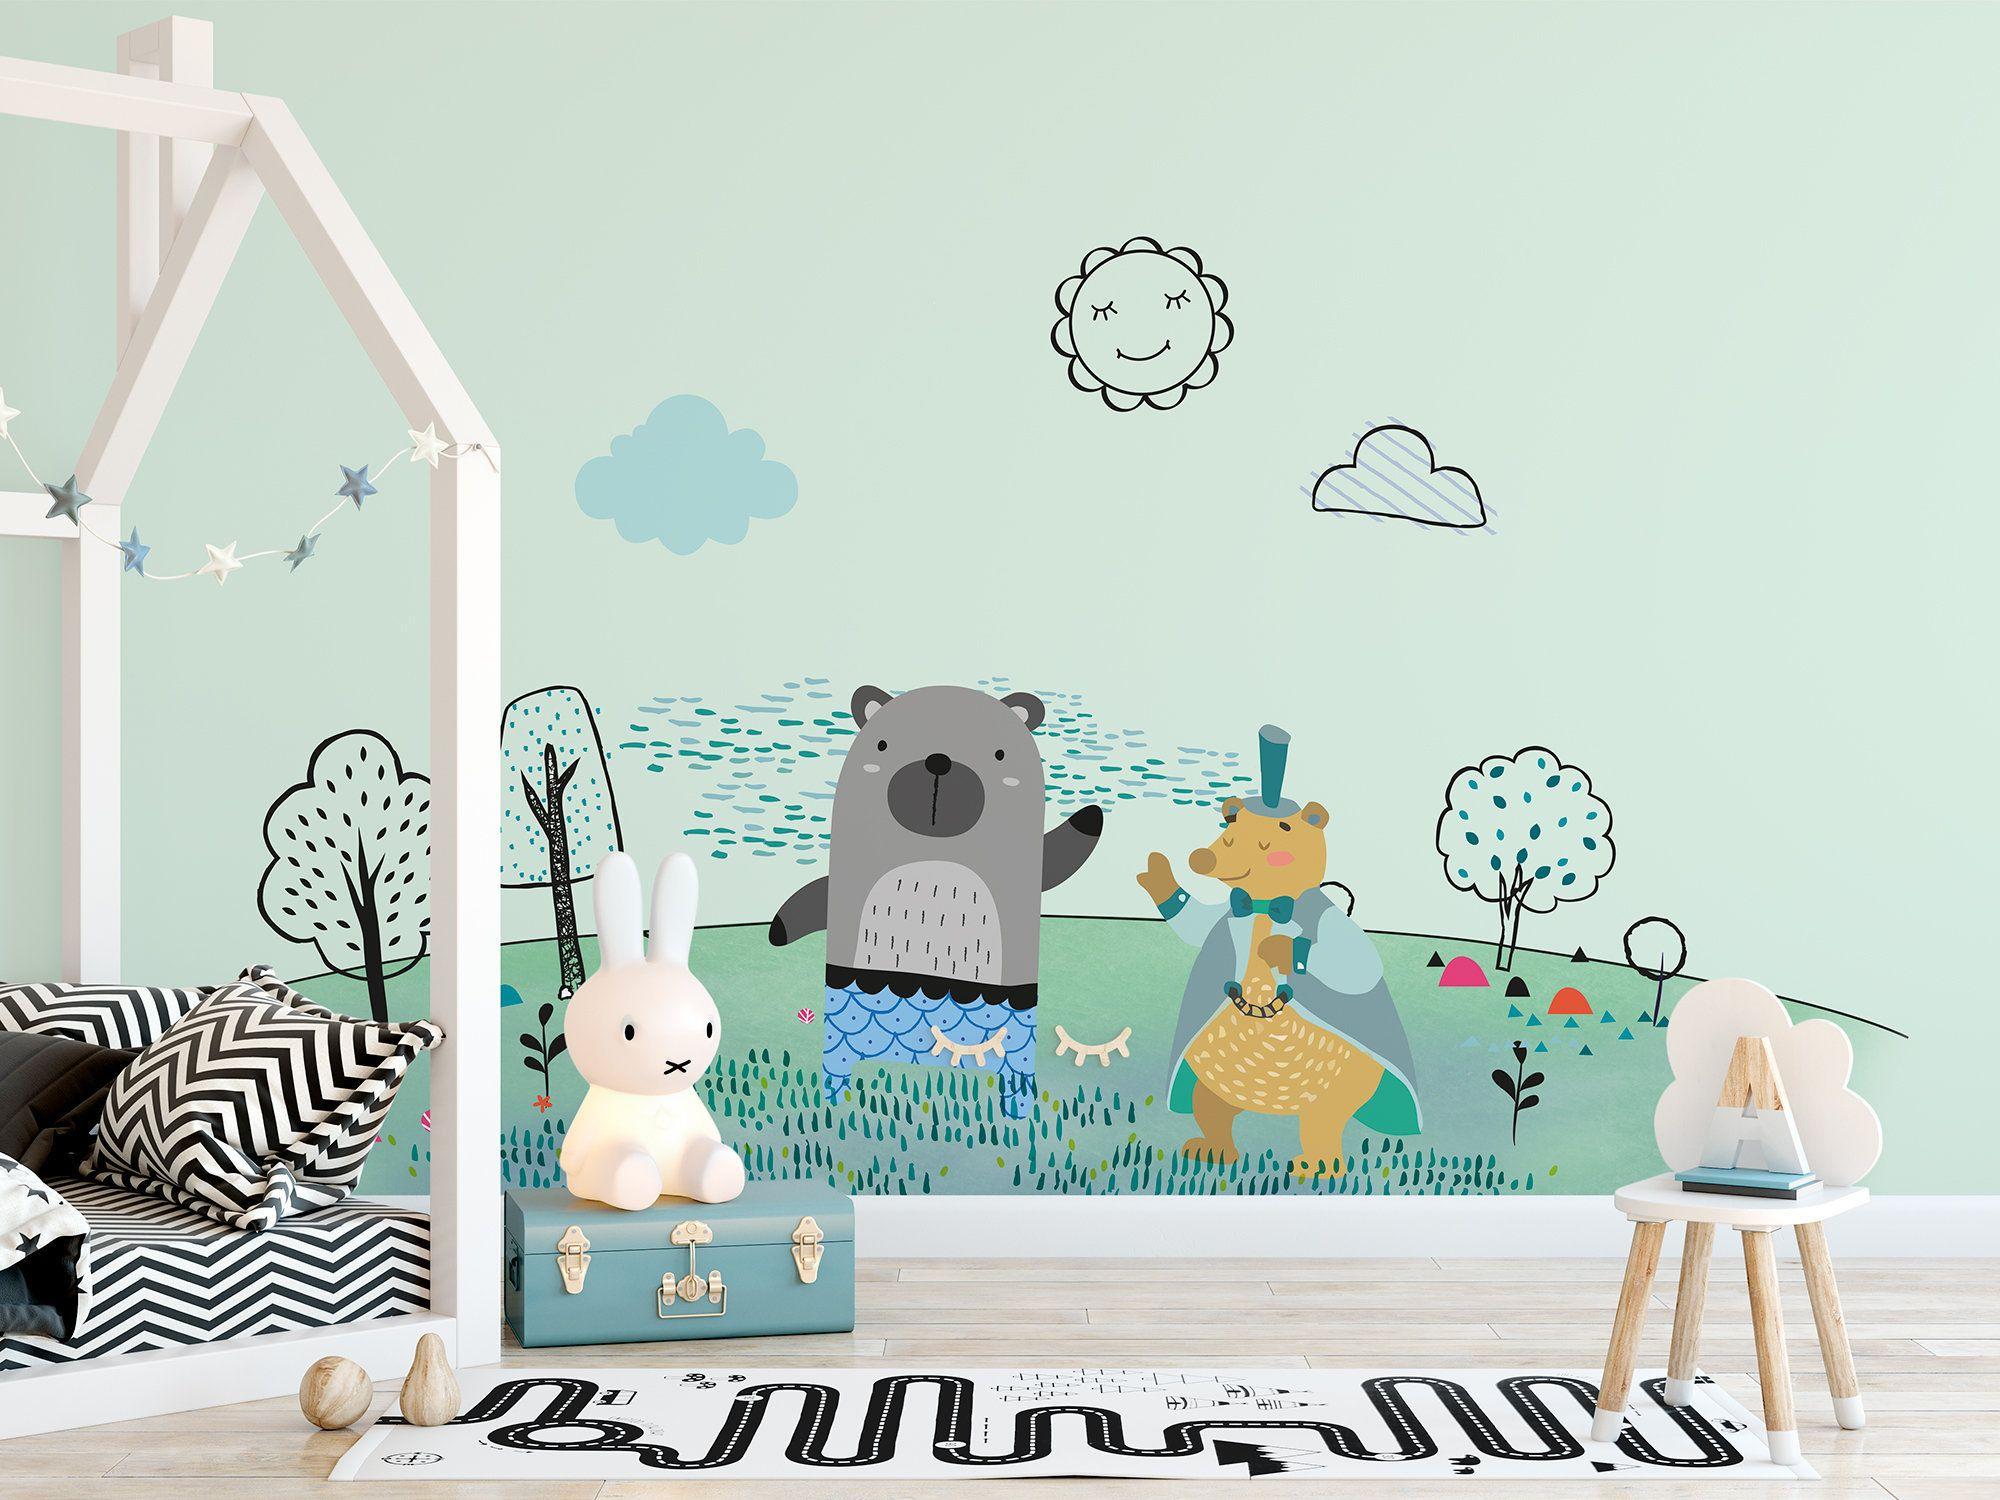 Bear Sun Tree Drawing Cartoon Wallpaper Self Adhesive Peel And Etsy Nursery Wallpaper Kids Wallpaper Kids Room Wallpaper